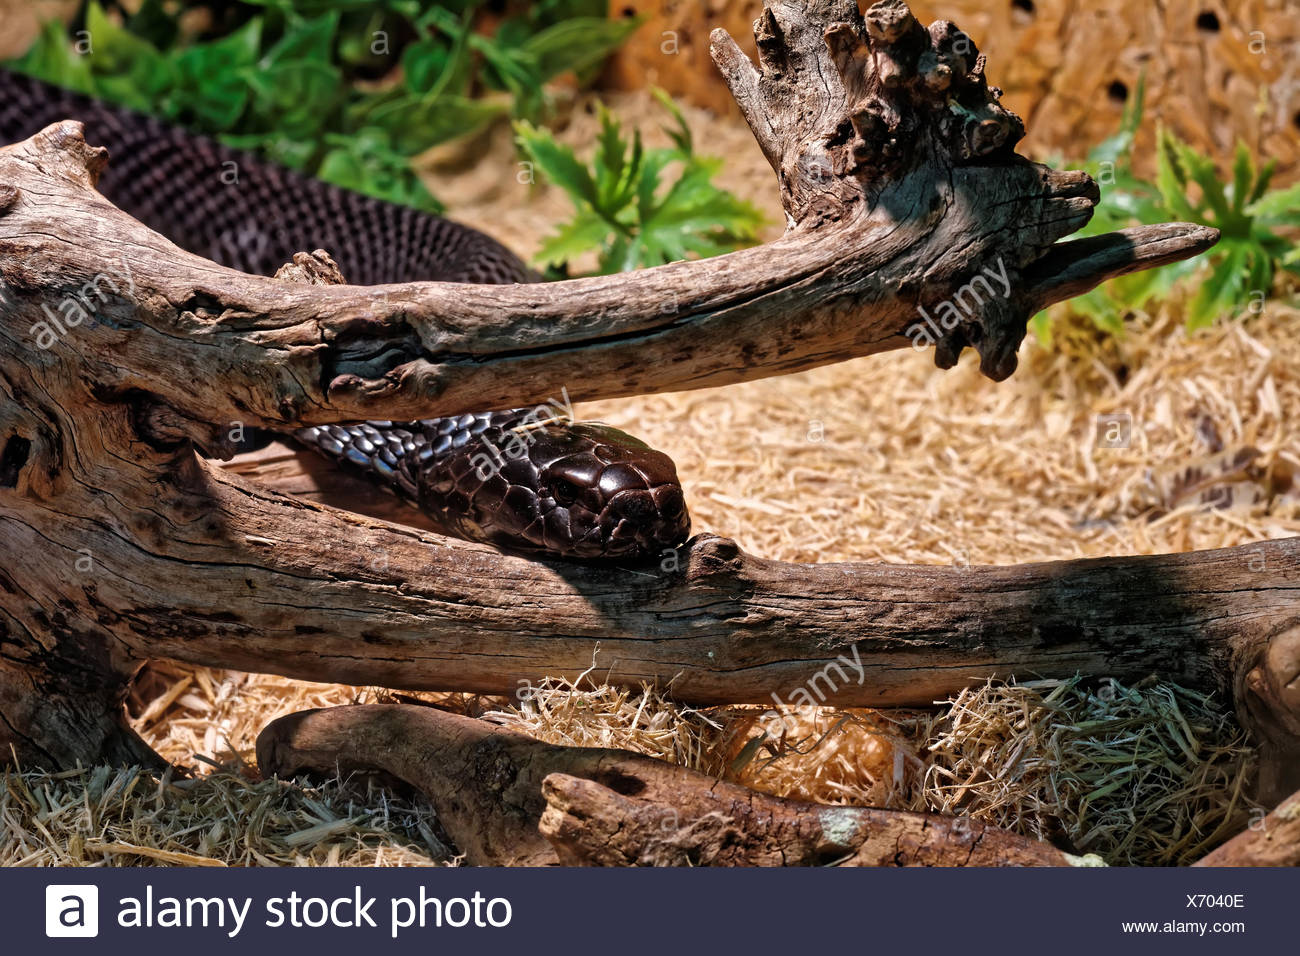 Snake In The Terrarium Black Mamba Stock Photo 279671630 Alamy